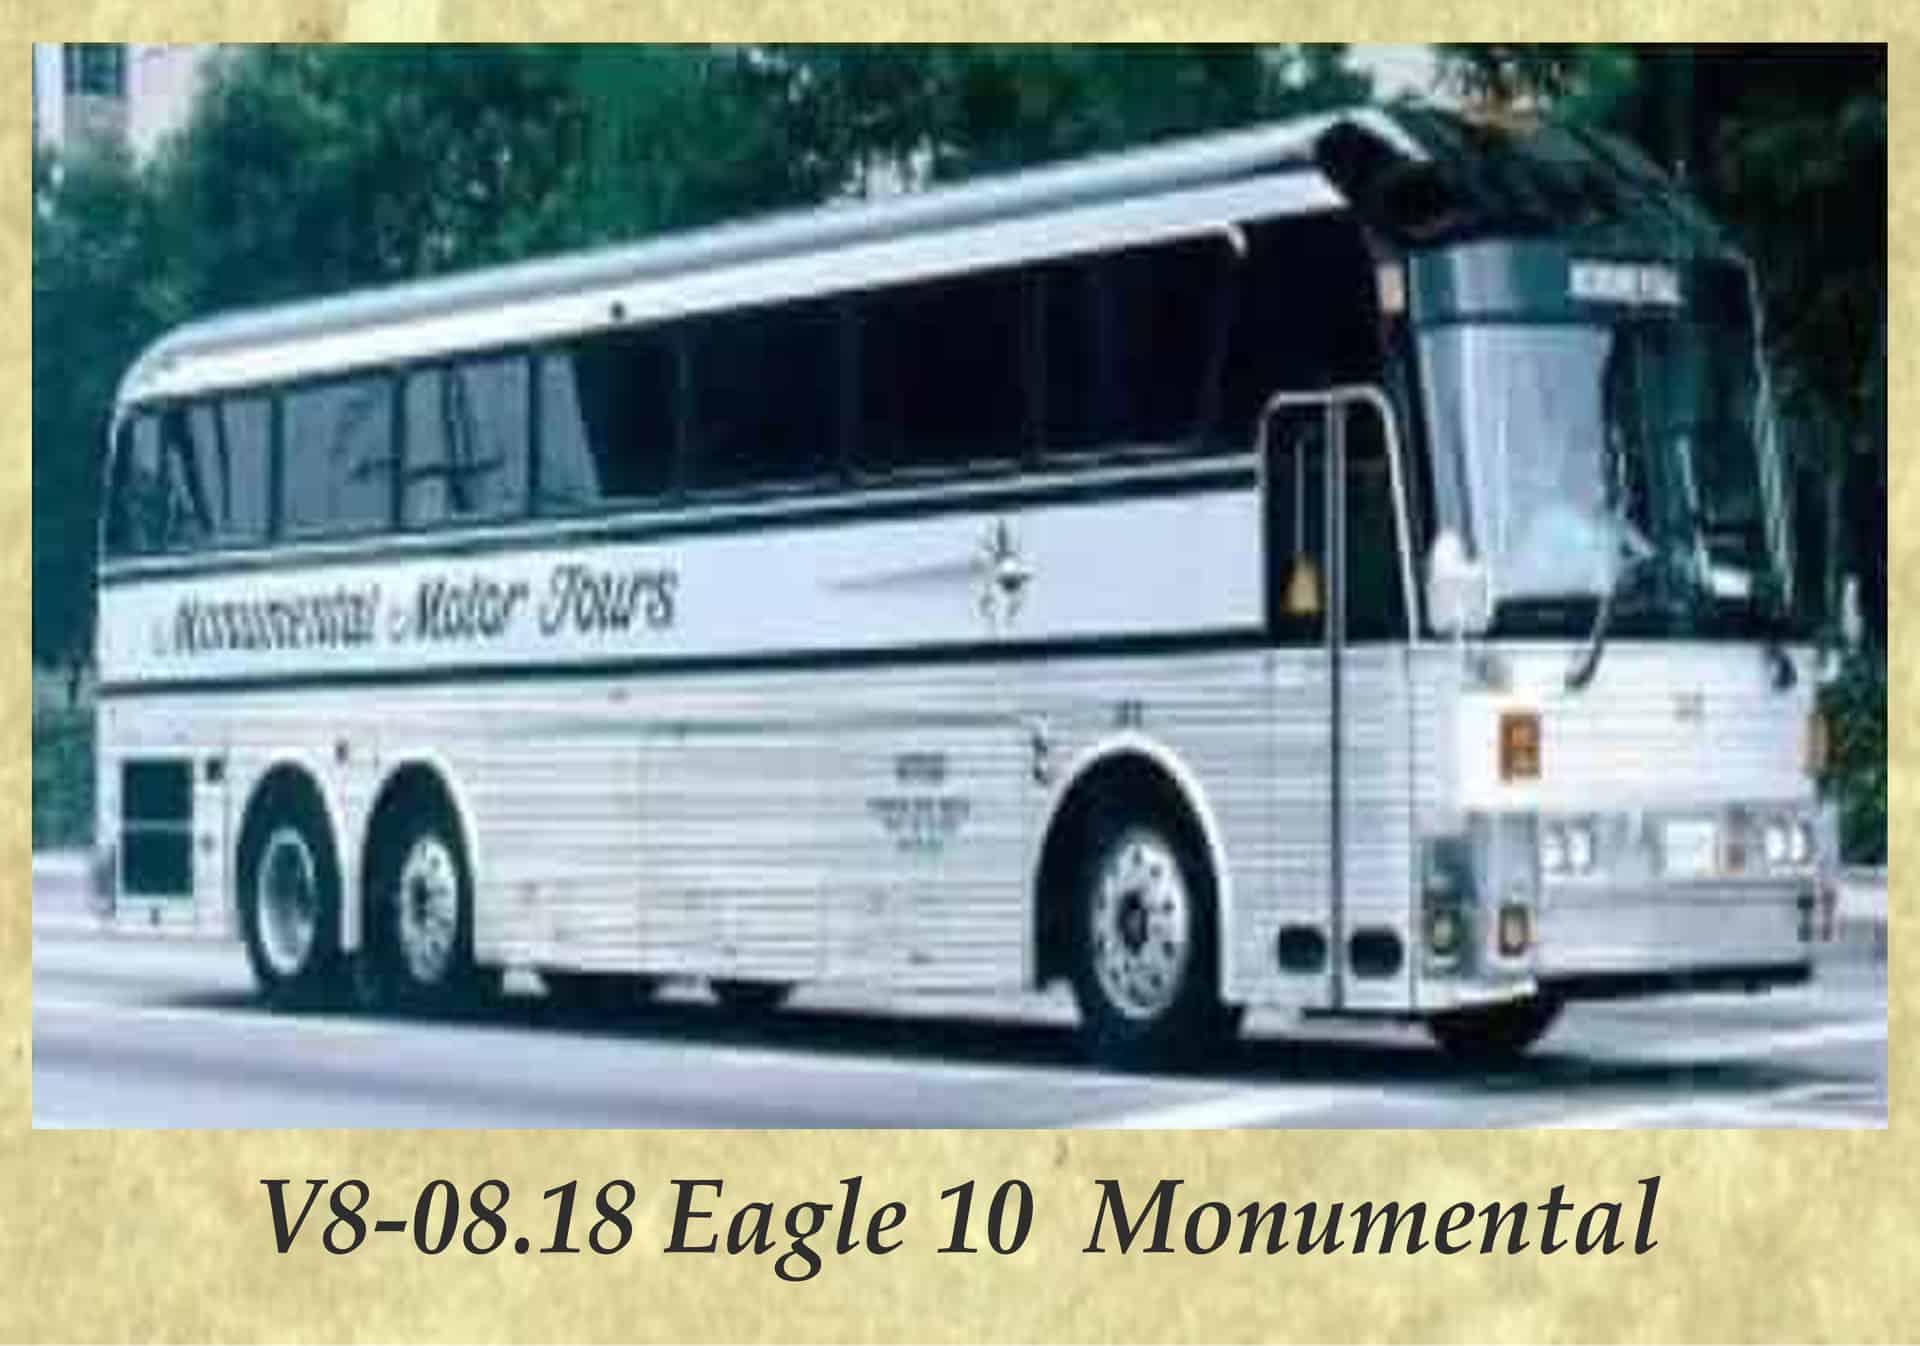 V8-08.18 Eagle 10 Monumental